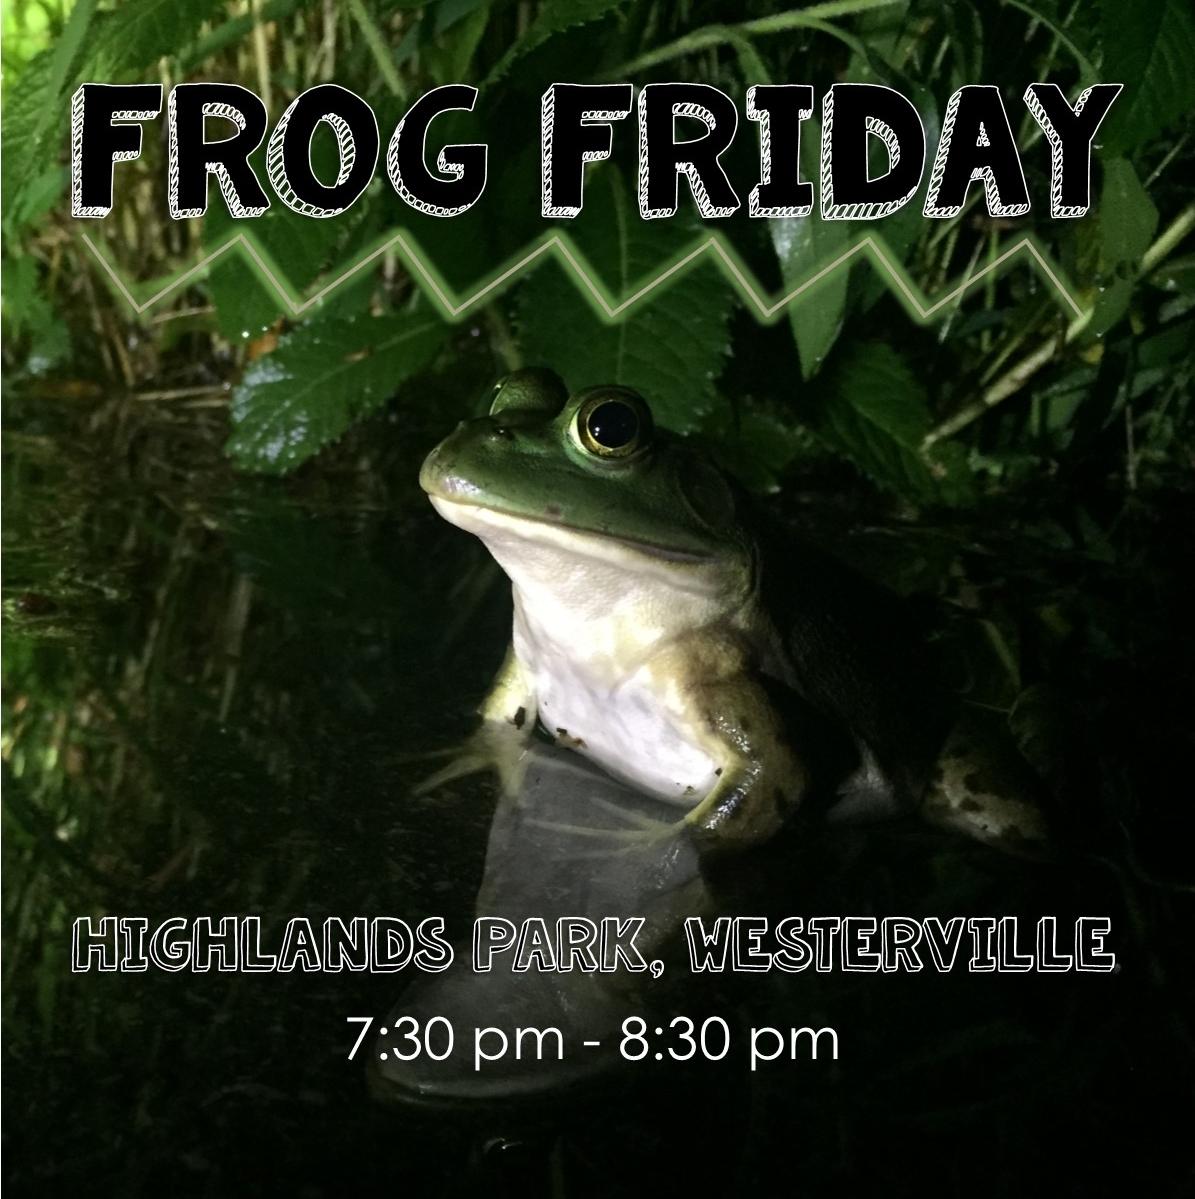 Bullfrog Frog Friday Ad.jpg